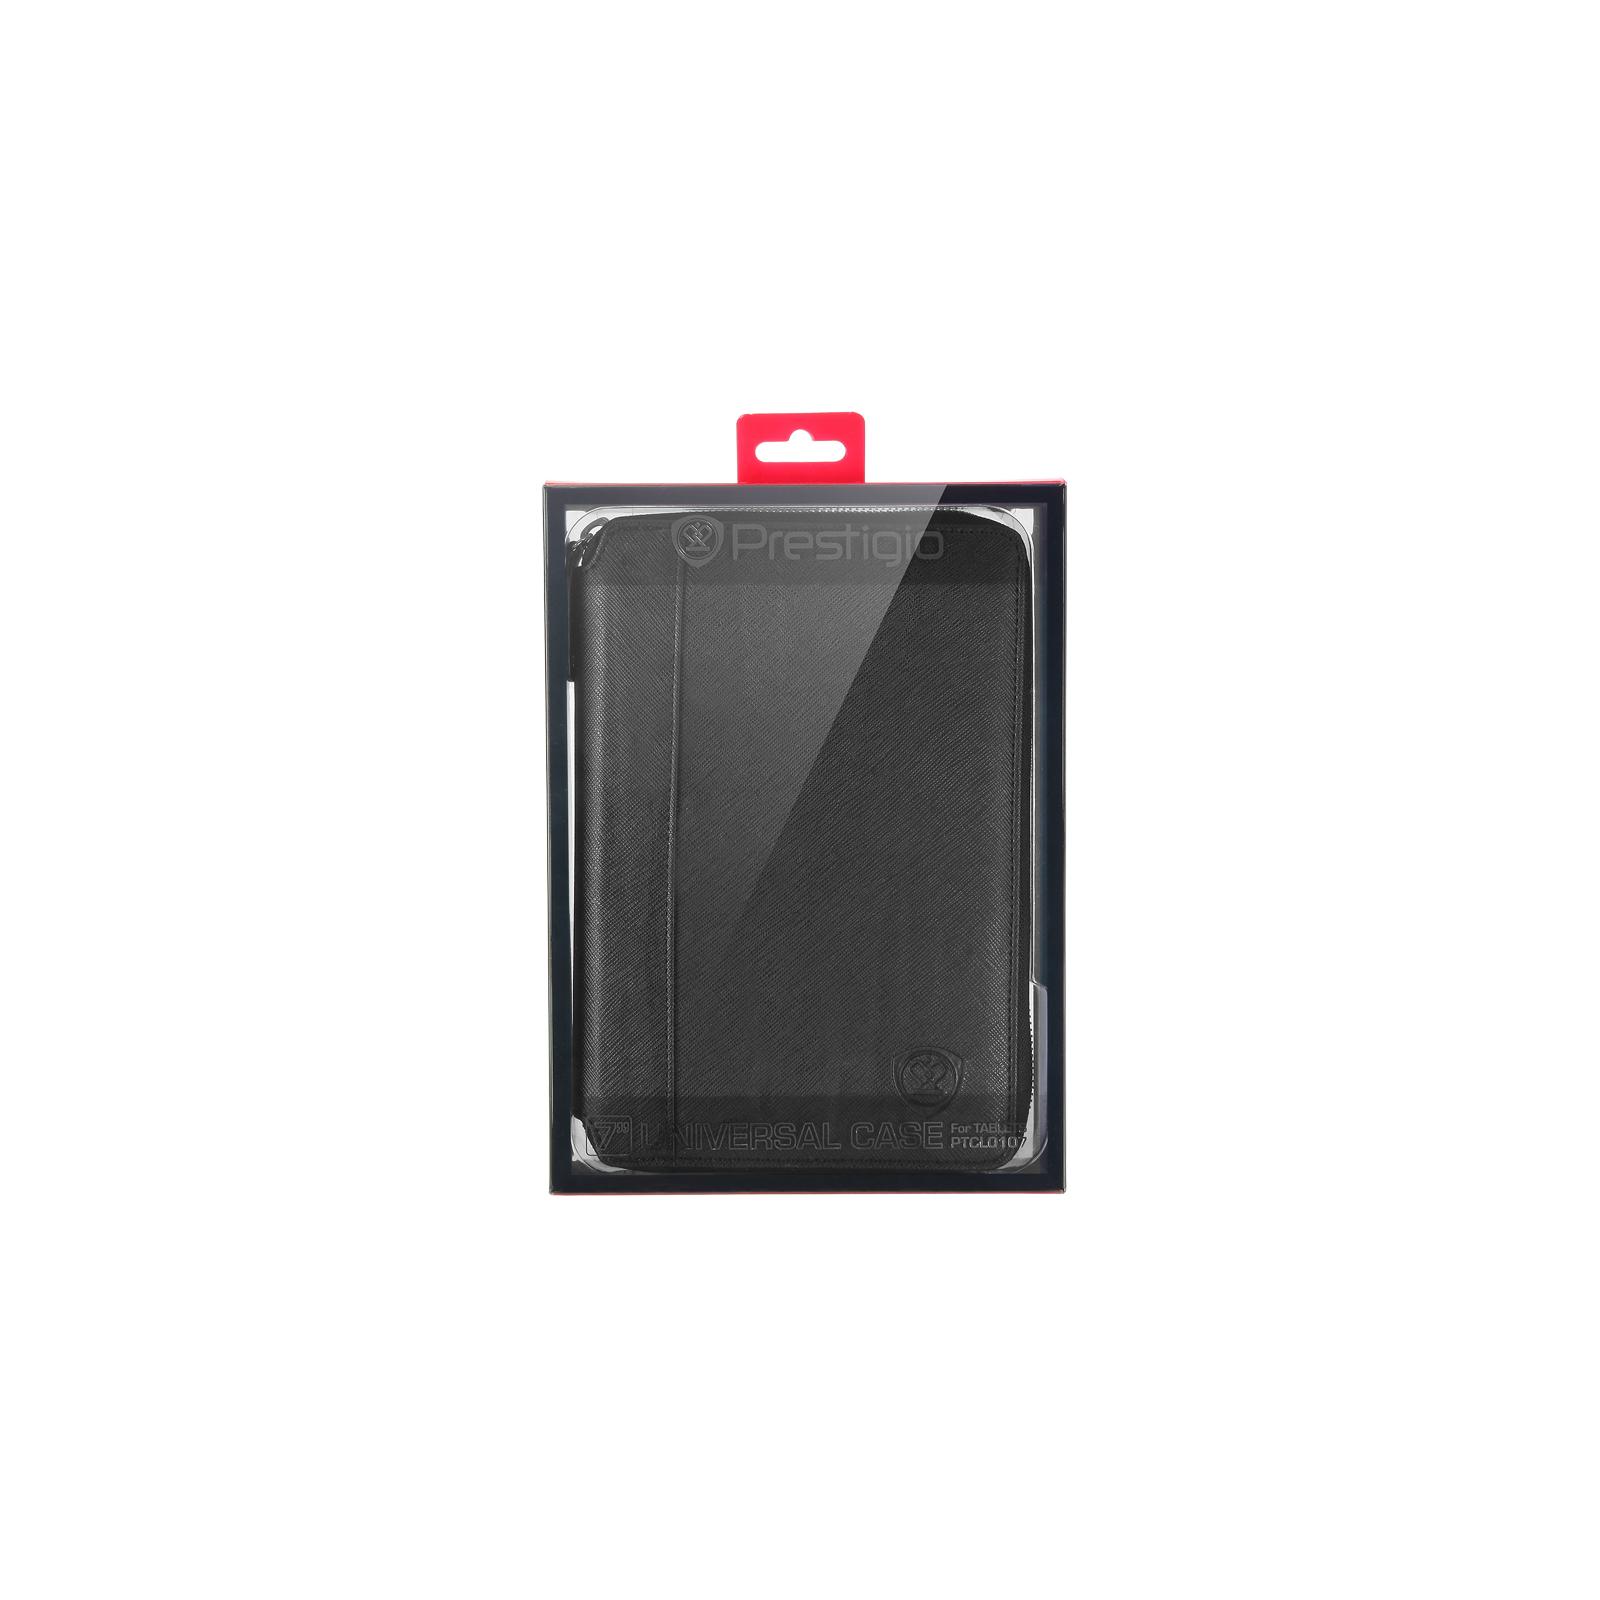 "Чехол для планшета PRESTIGIO 7"" Universal BLACK zipper+pocket (PTCL0107BK) изображение 7"